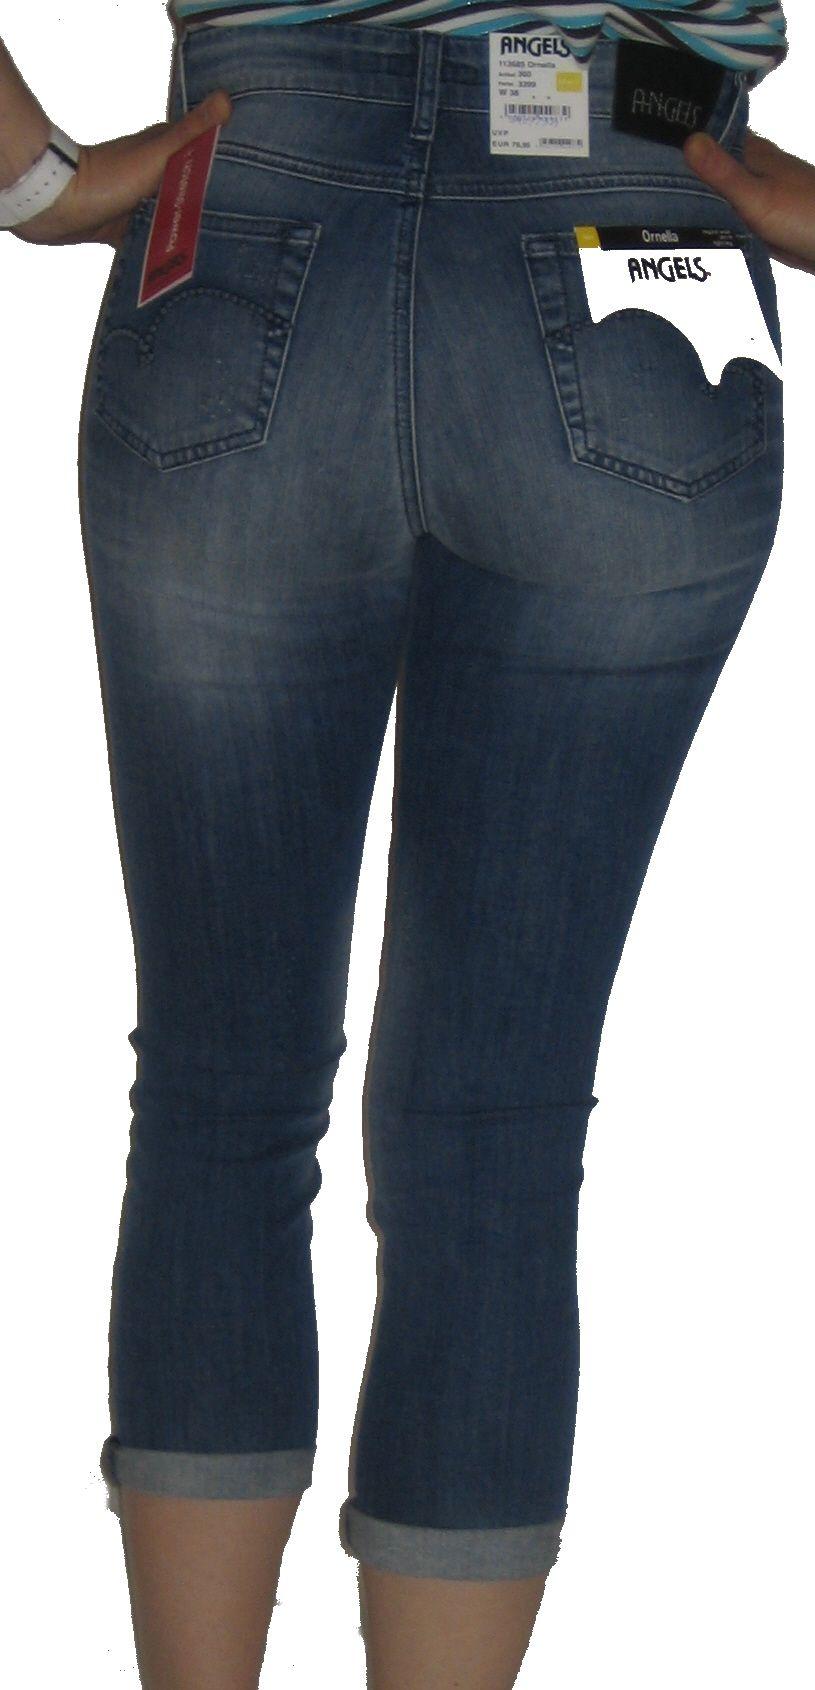 Angels Jeans Ornella 113685 Short 7/8 Hose Stretch 360